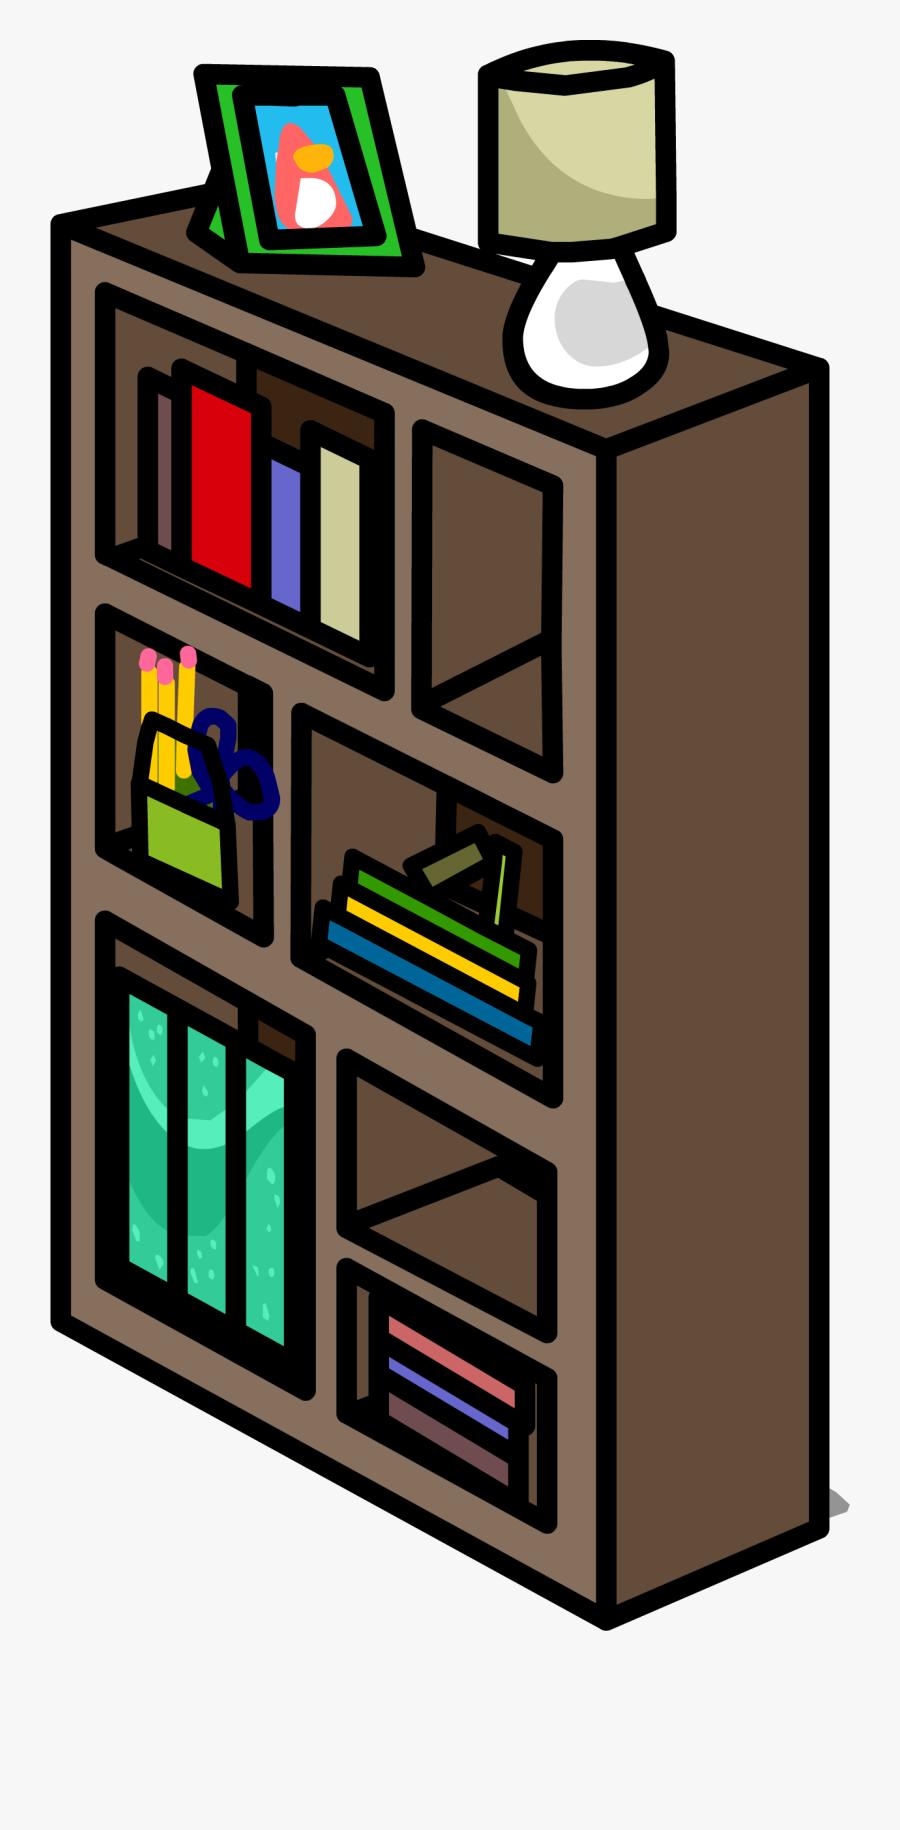 Funky Bookshelf Sprite - Wooden Box Clipart, Transparent Clipart